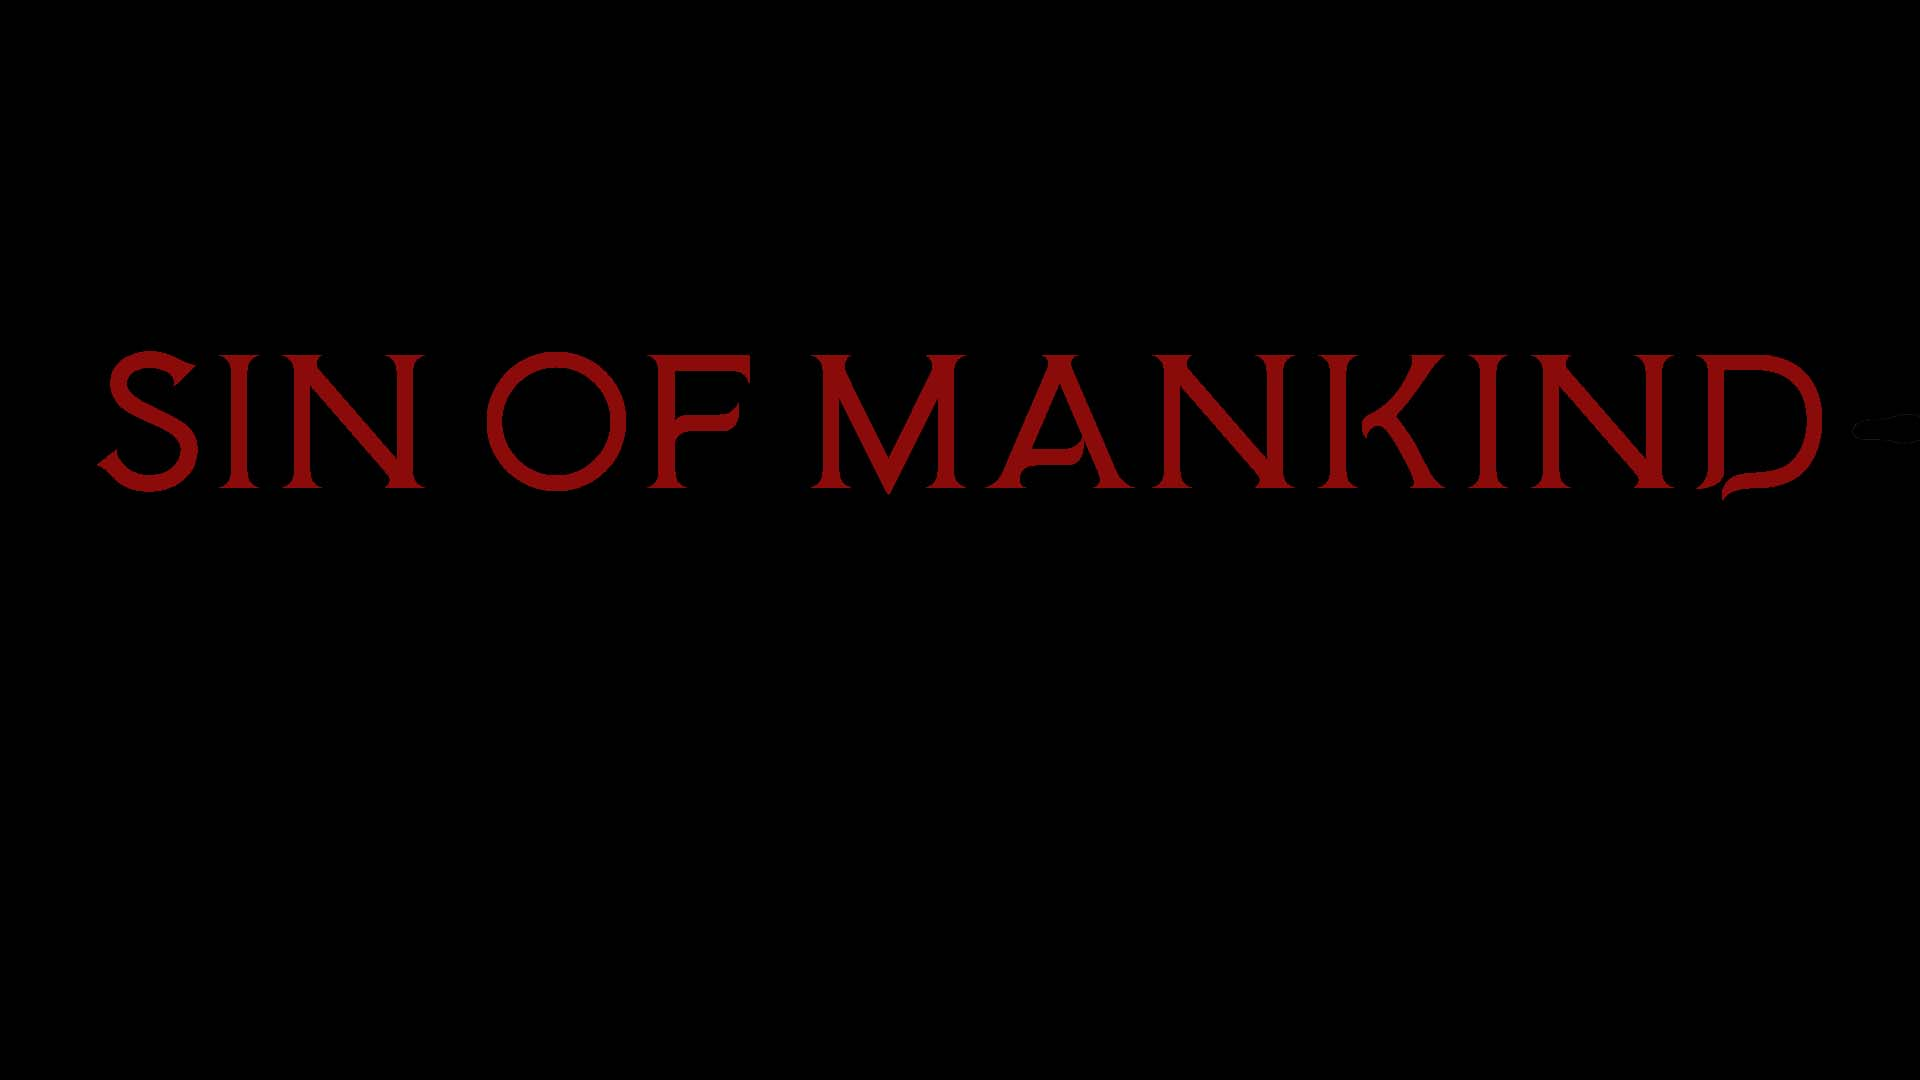 Sin of Mankind